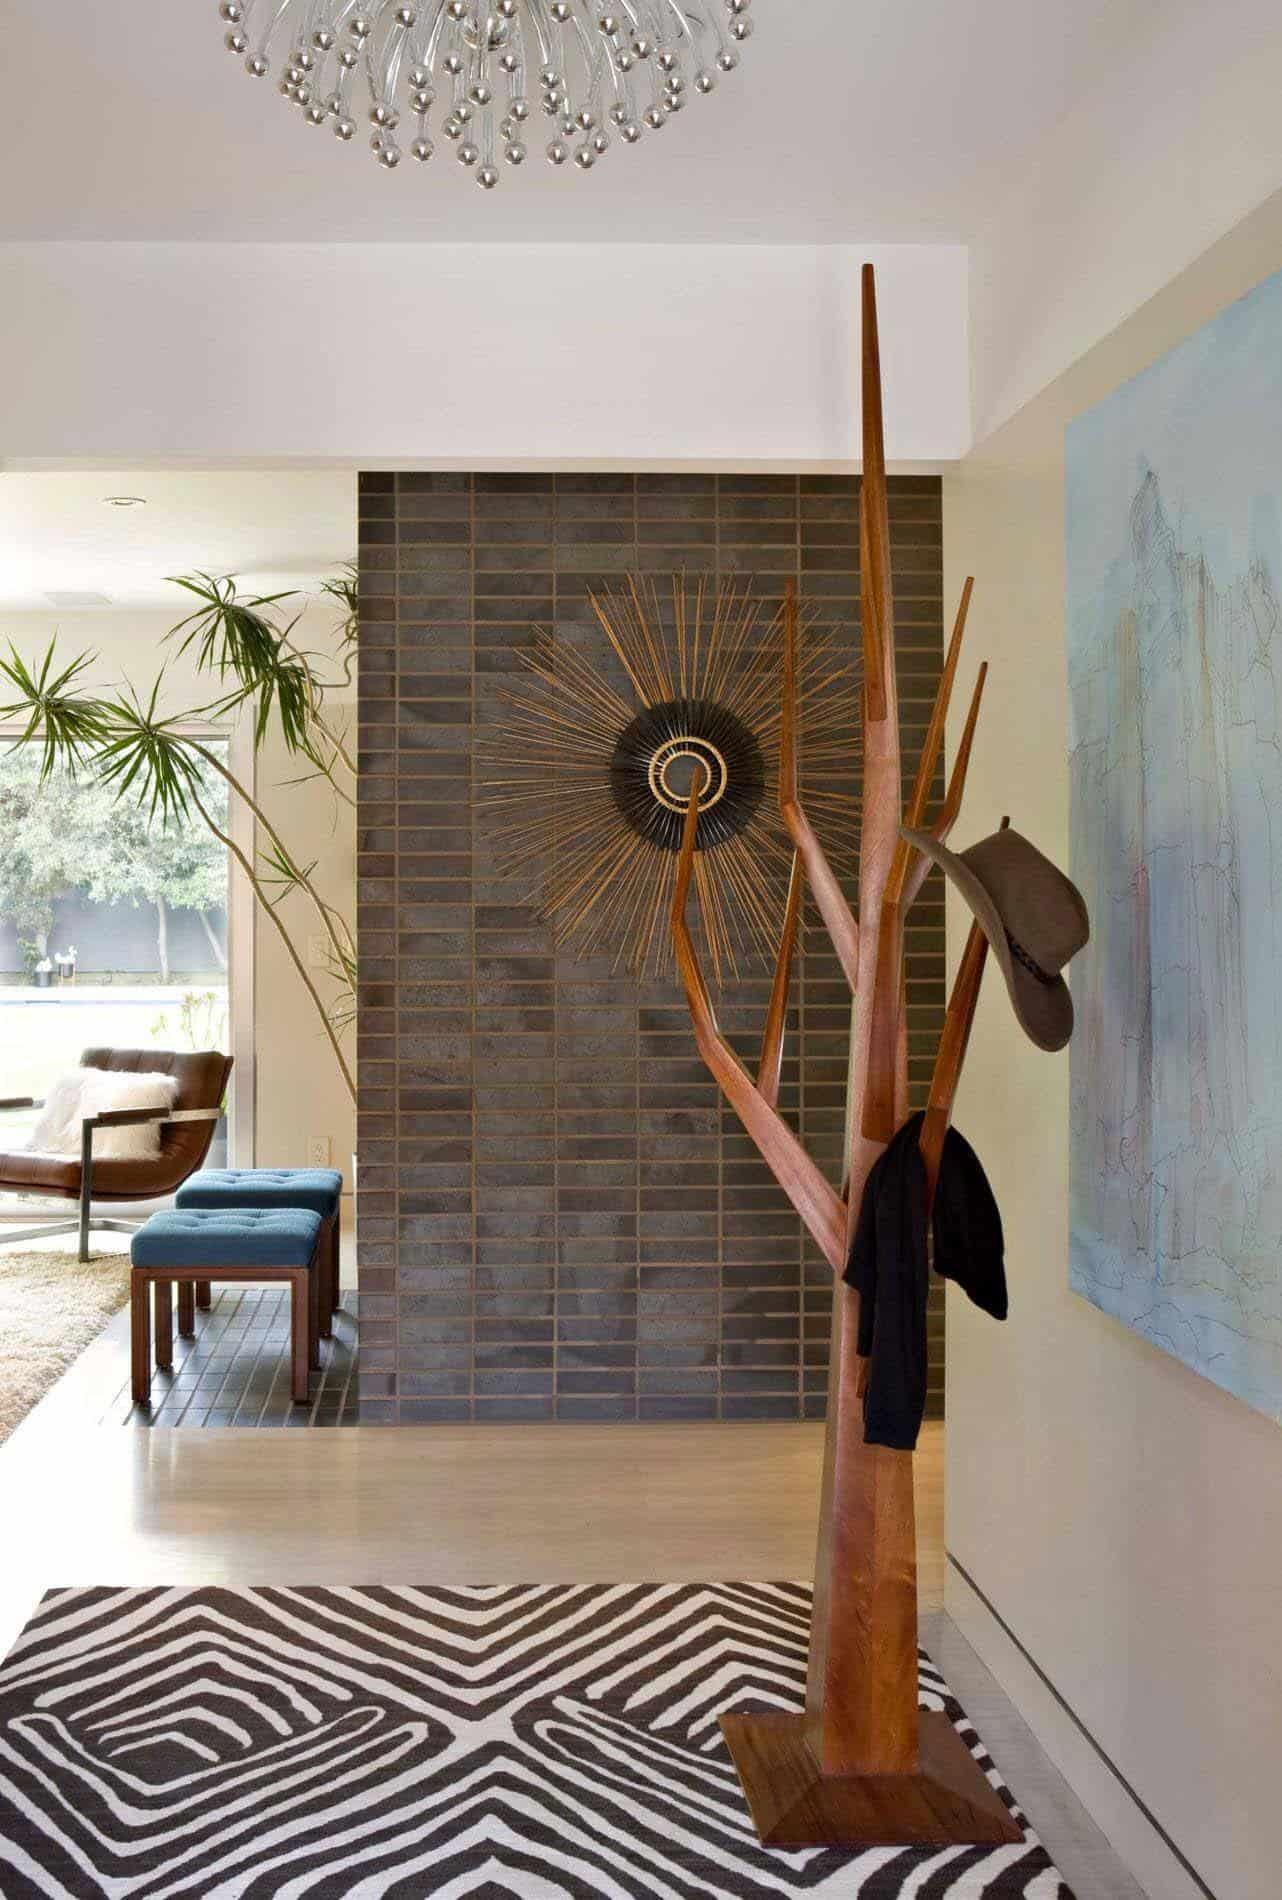 Maison Moderne Mid-Century-Jamie Bush-04-1 Kindesign